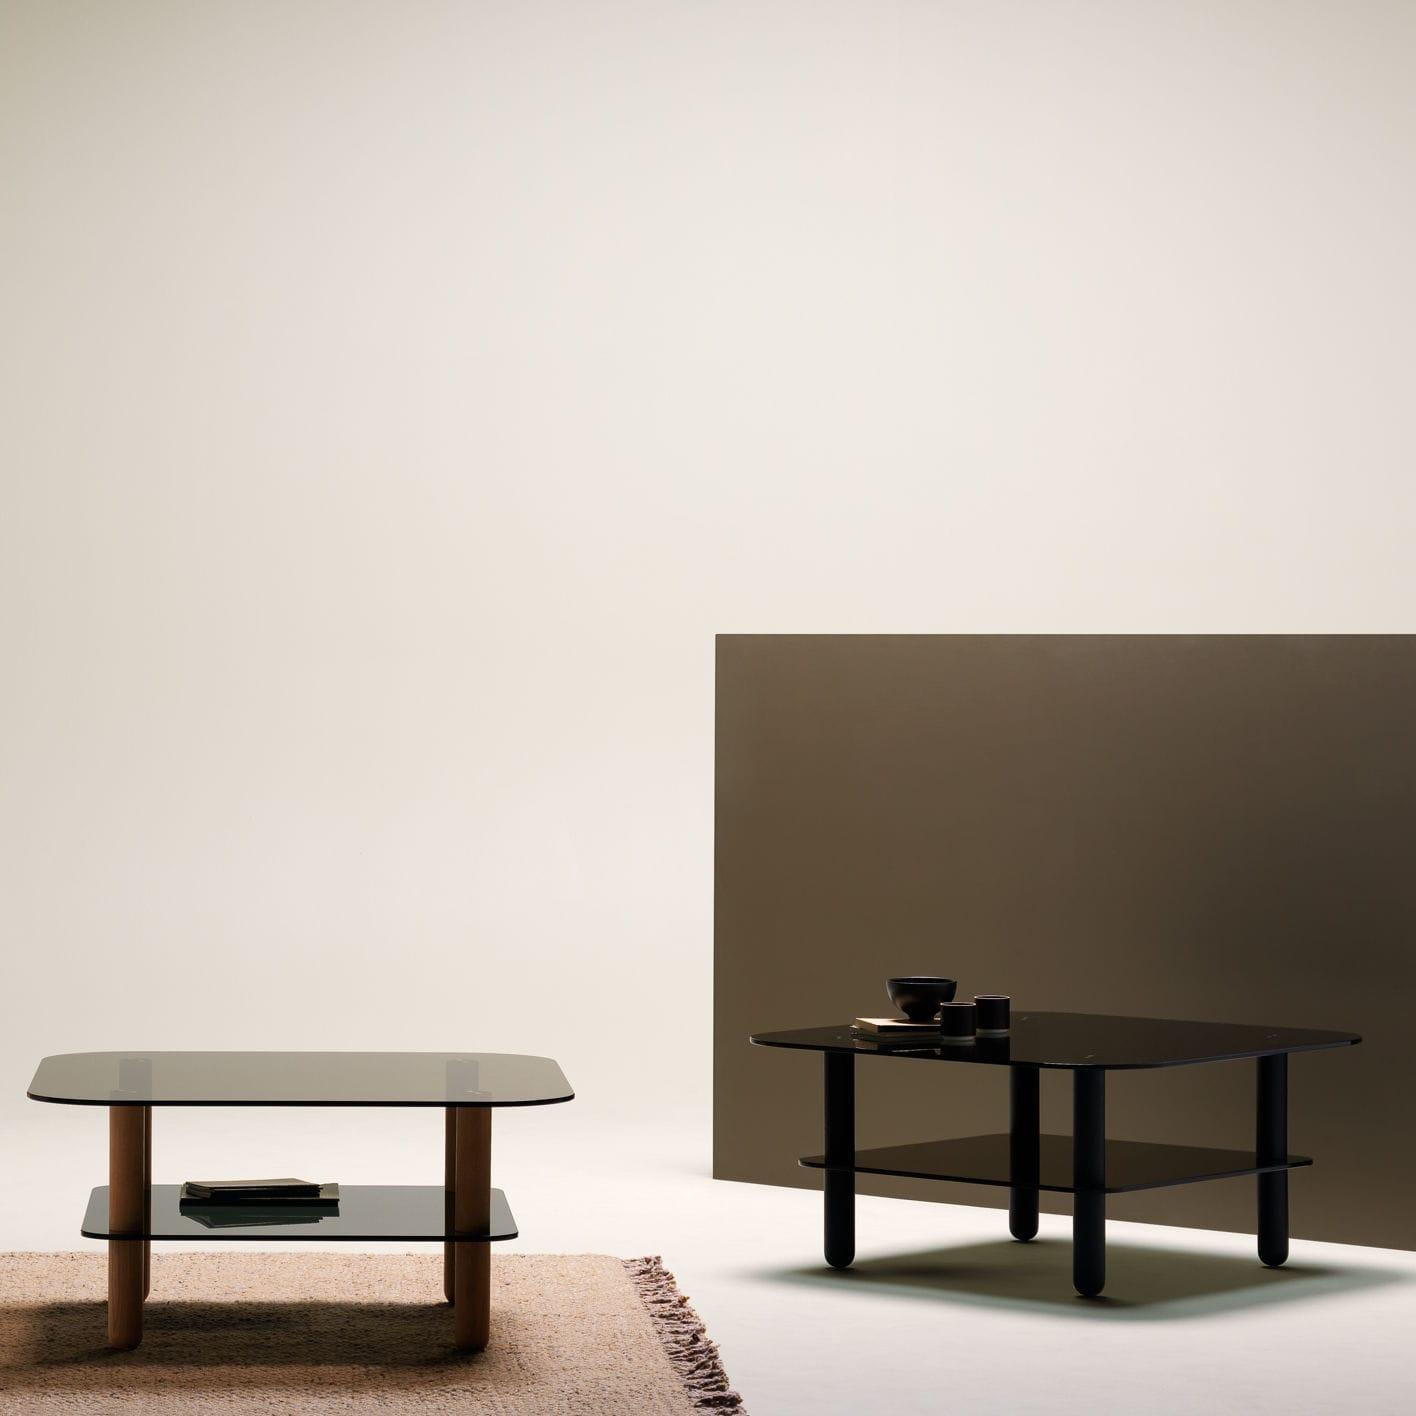 contemporary coffee table big sur fogia tempered glass oak base square